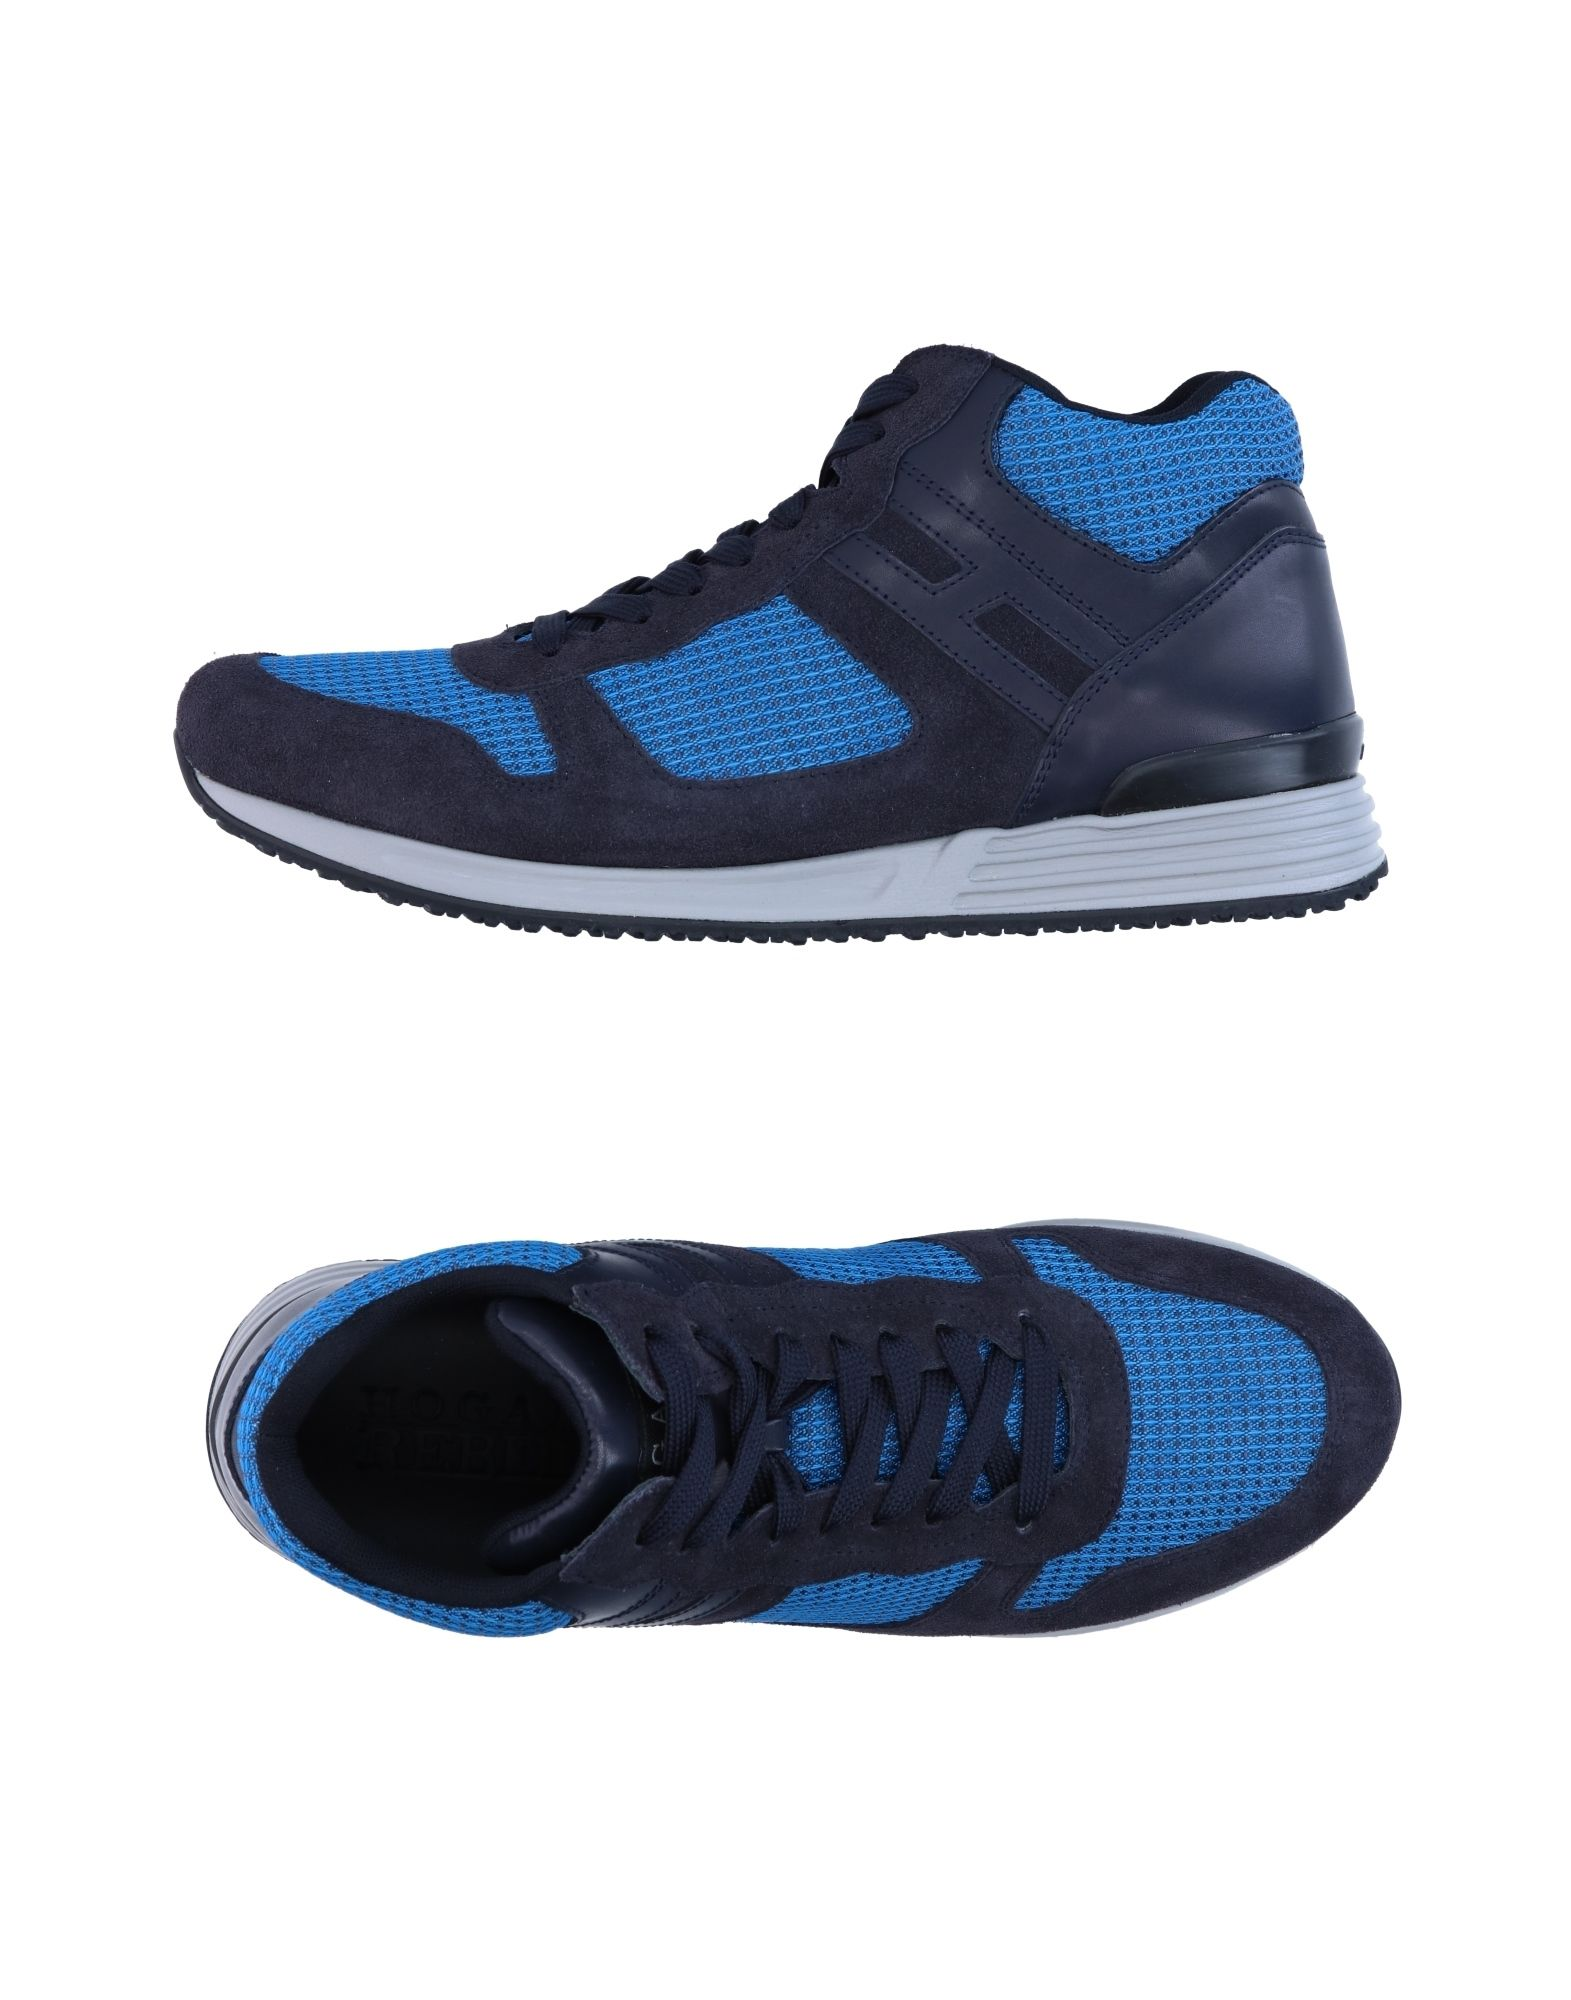 Hogan Rebel Sneakers Herren  11288826OA Gute Qualität beliebte Schuhe